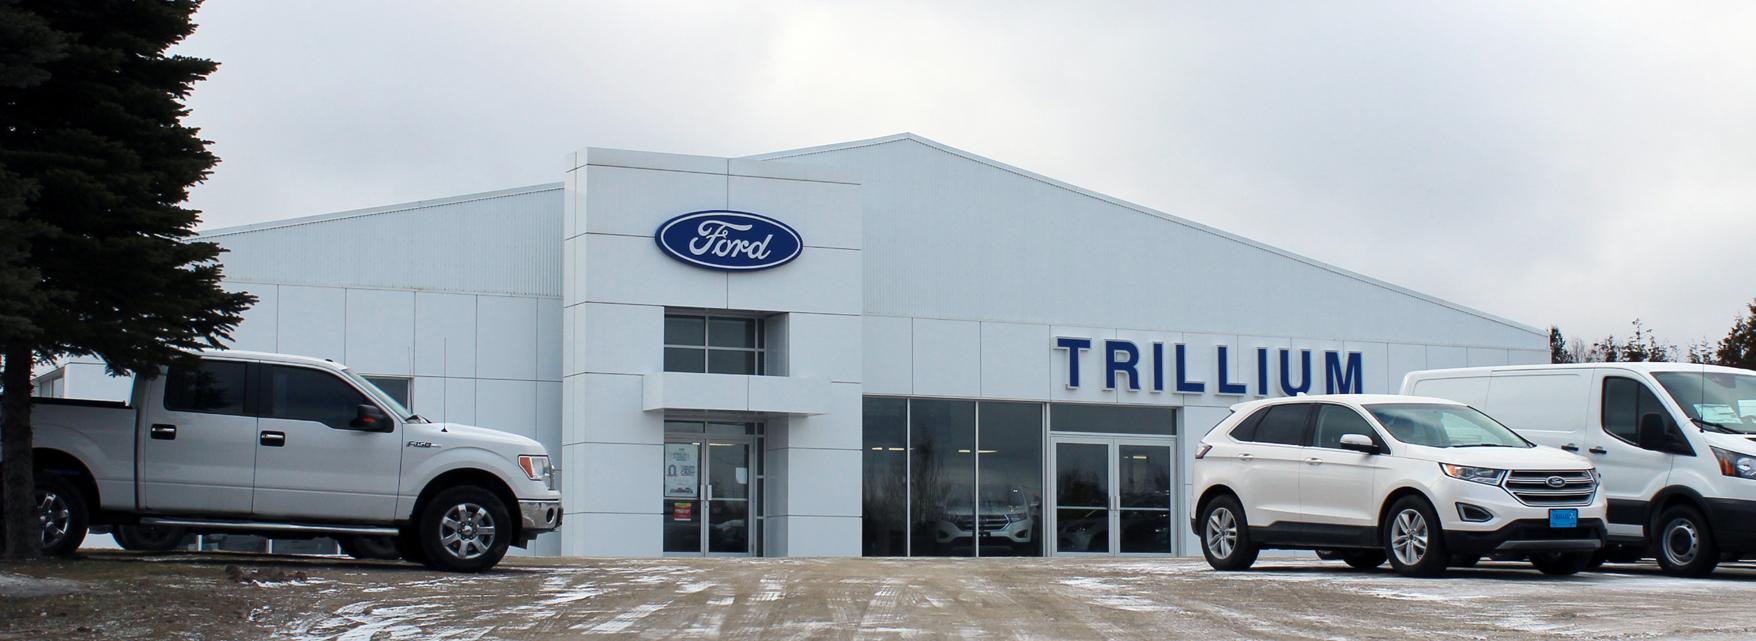 Trillium Ford Lincoln - Dealership